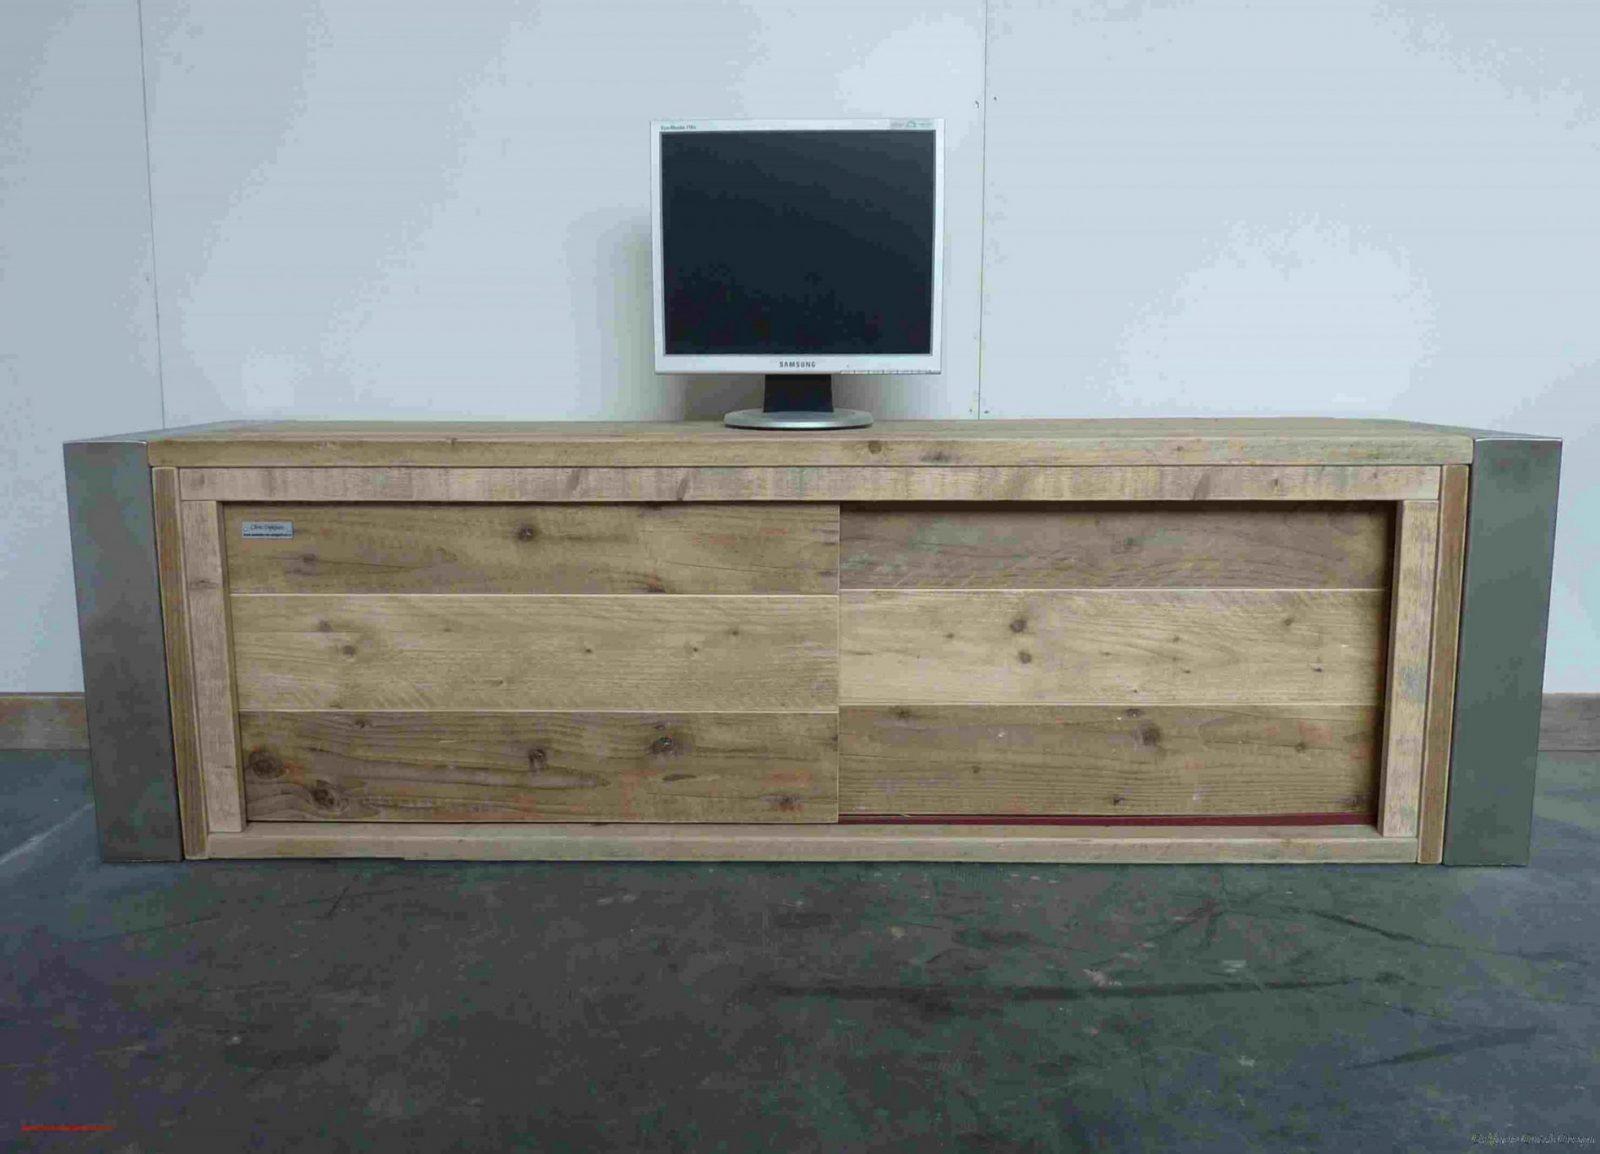 Tv Rack Selber Bauen Branché Tv Schrank Holz Tv Board Lexi Von Mömax von Tv Schrank Selber Bauen Bild